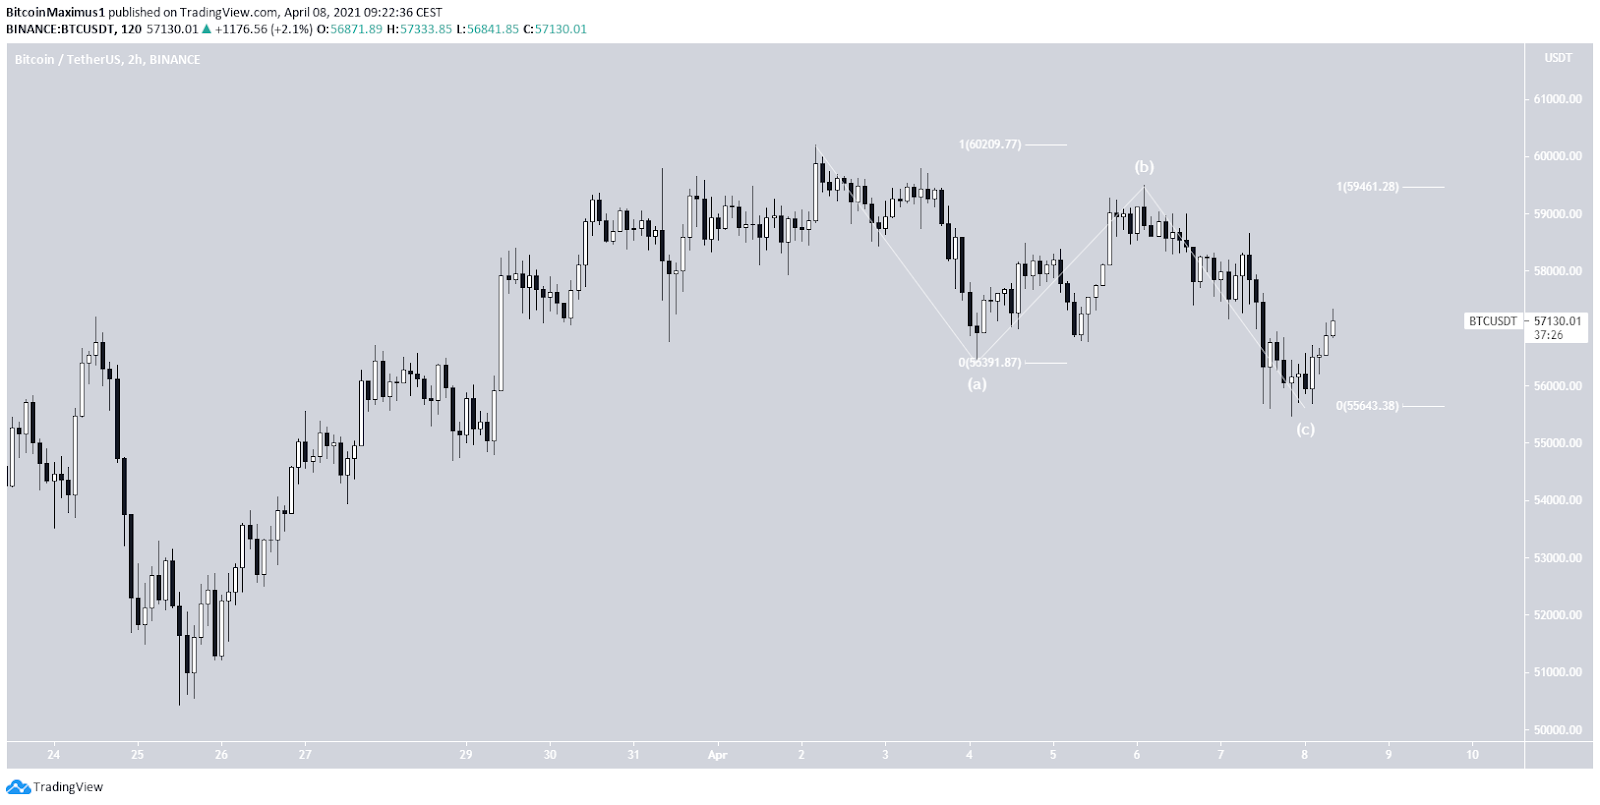 Bitcoin Kurs Wellenanalyse 08.04.2021